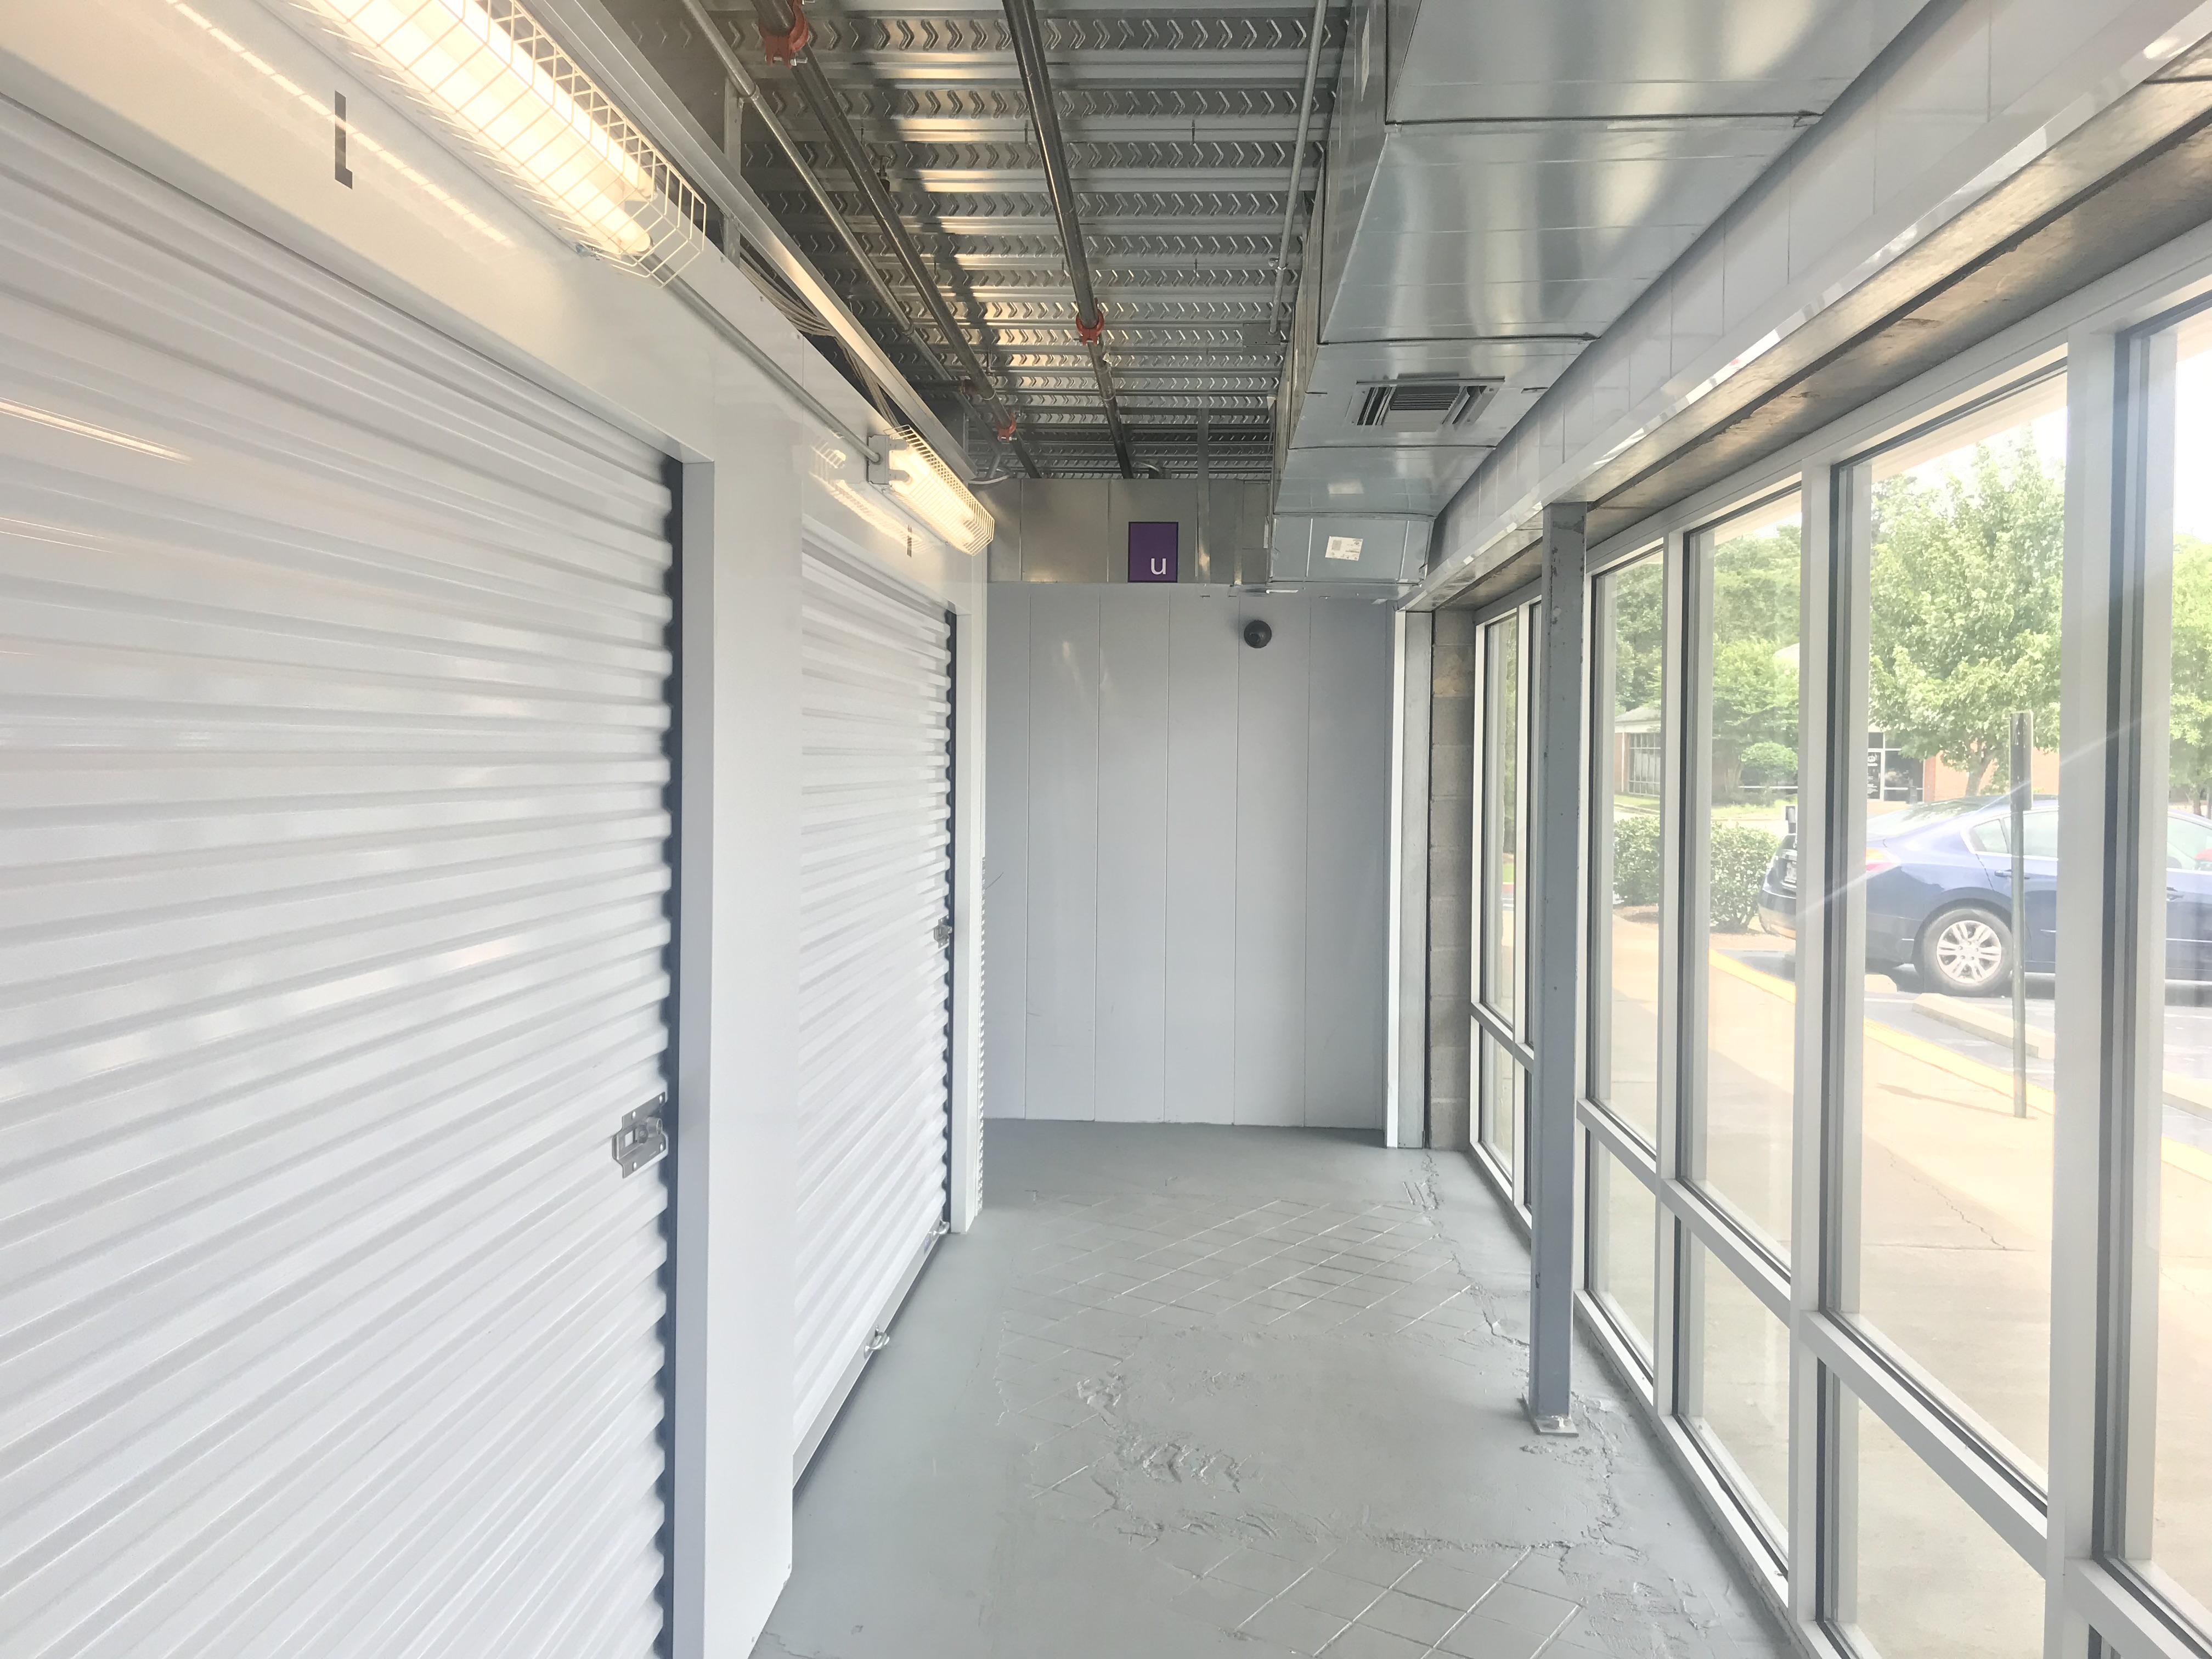 Maumelle U Storage has Climate Control Storage Units